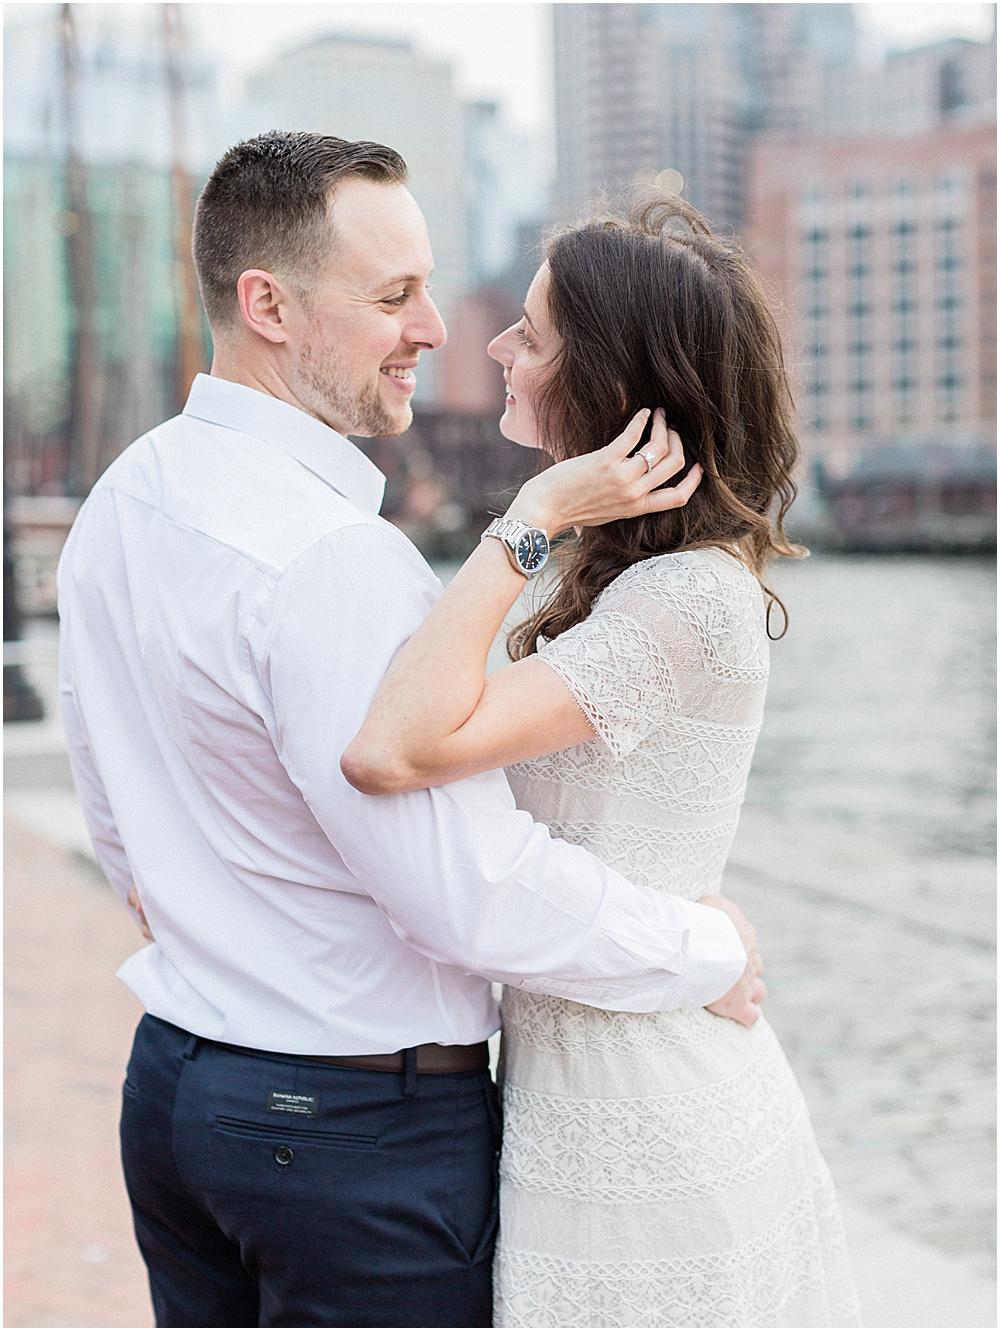 trillium_beer_brewery_seaport_engagement_session_massachusetts_boston_wedding_photographer_meredith_jane_photography_photo_0430.jpg